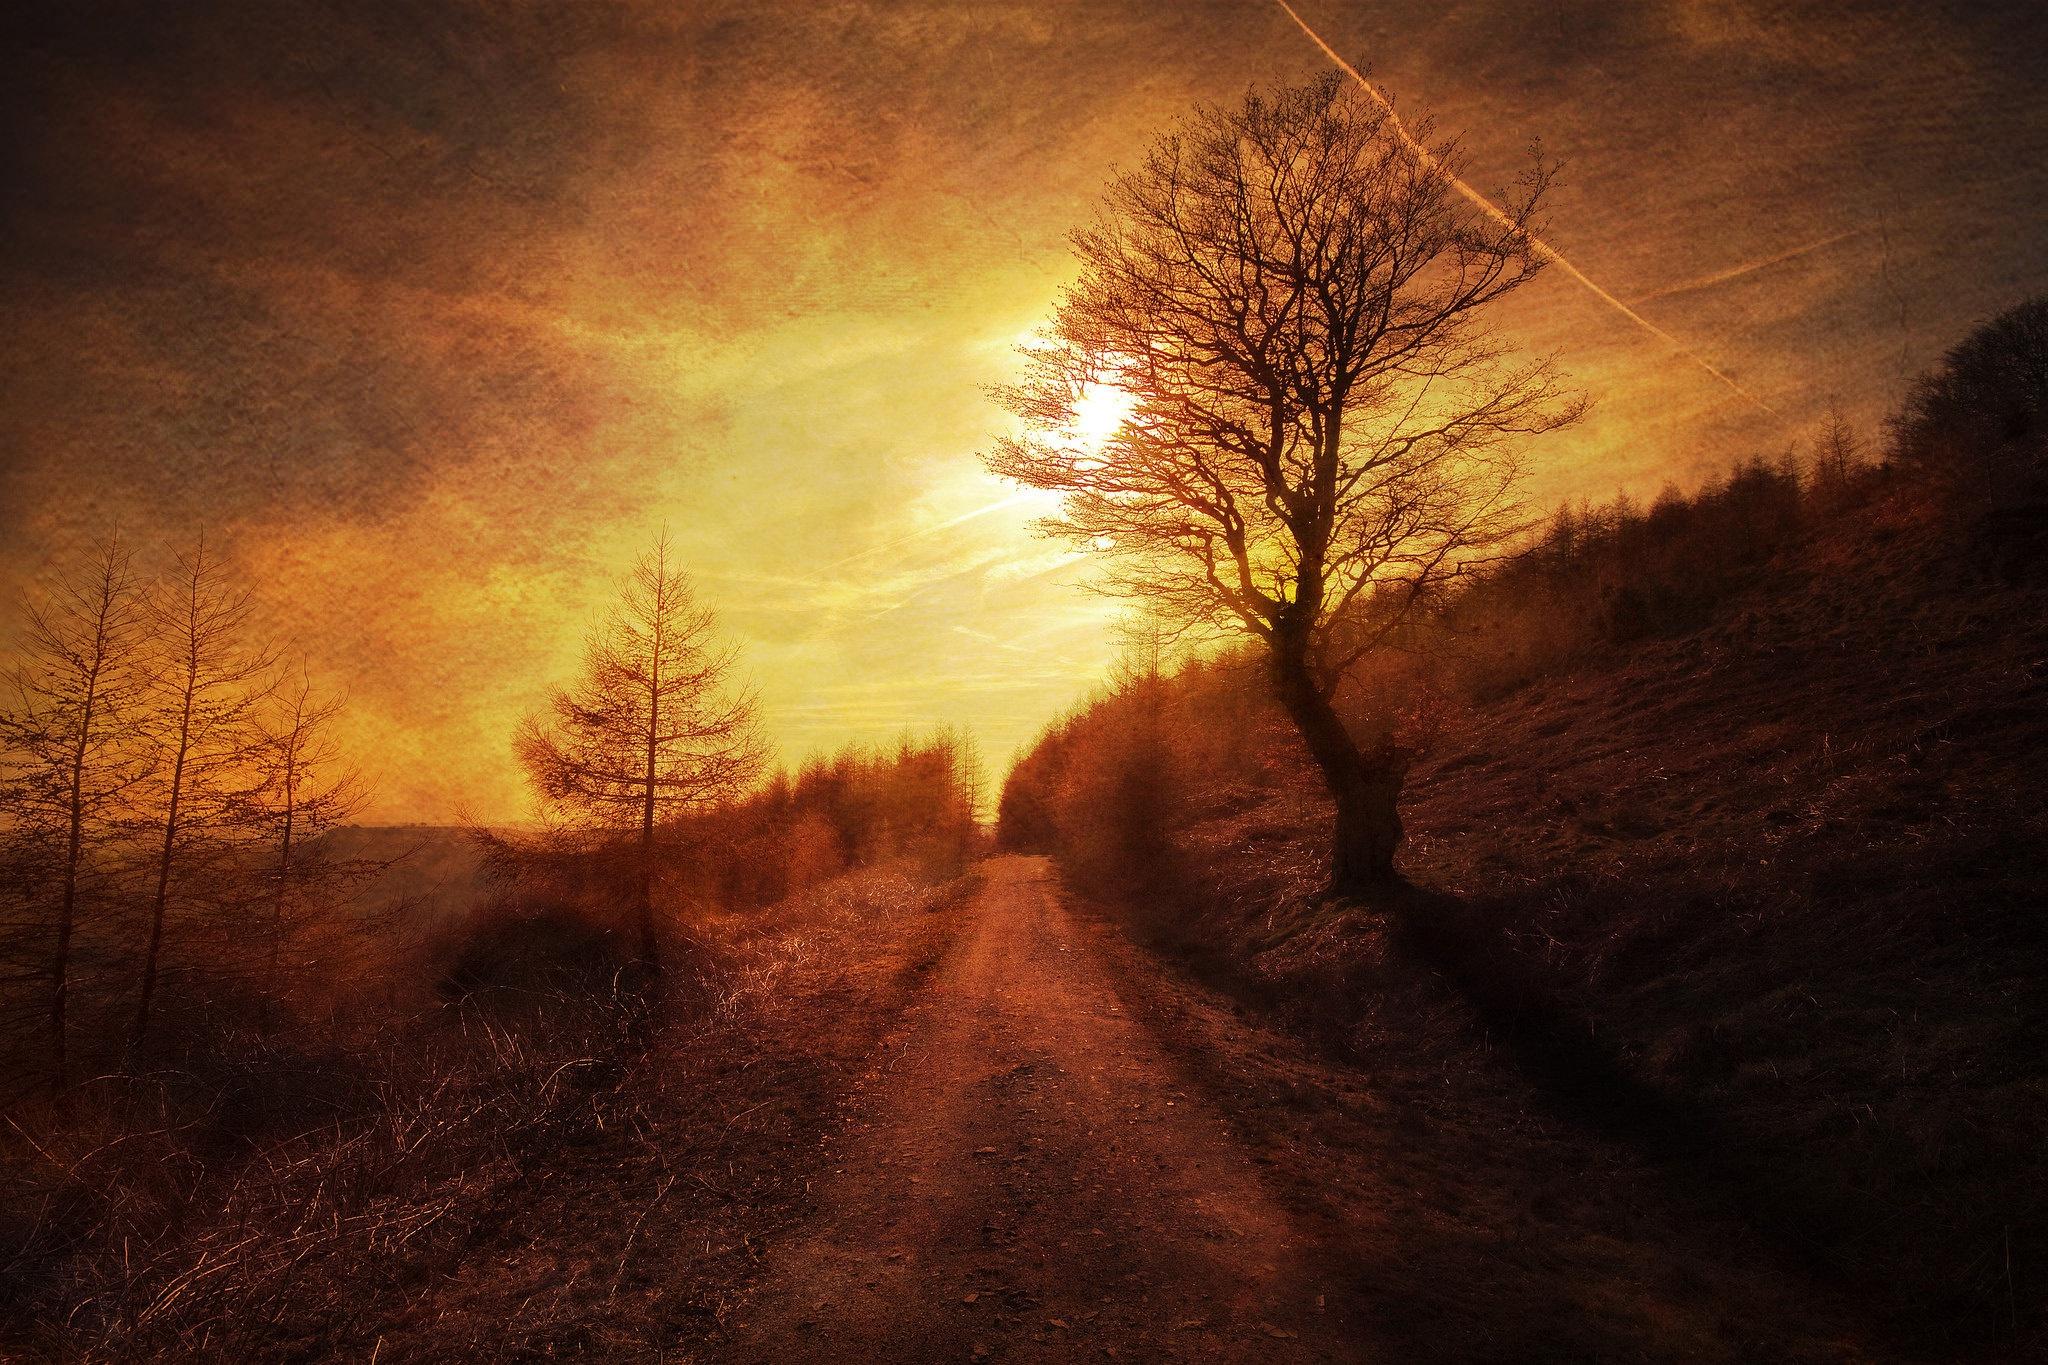 закат склон sunset the slope  № 1569330 загрузить